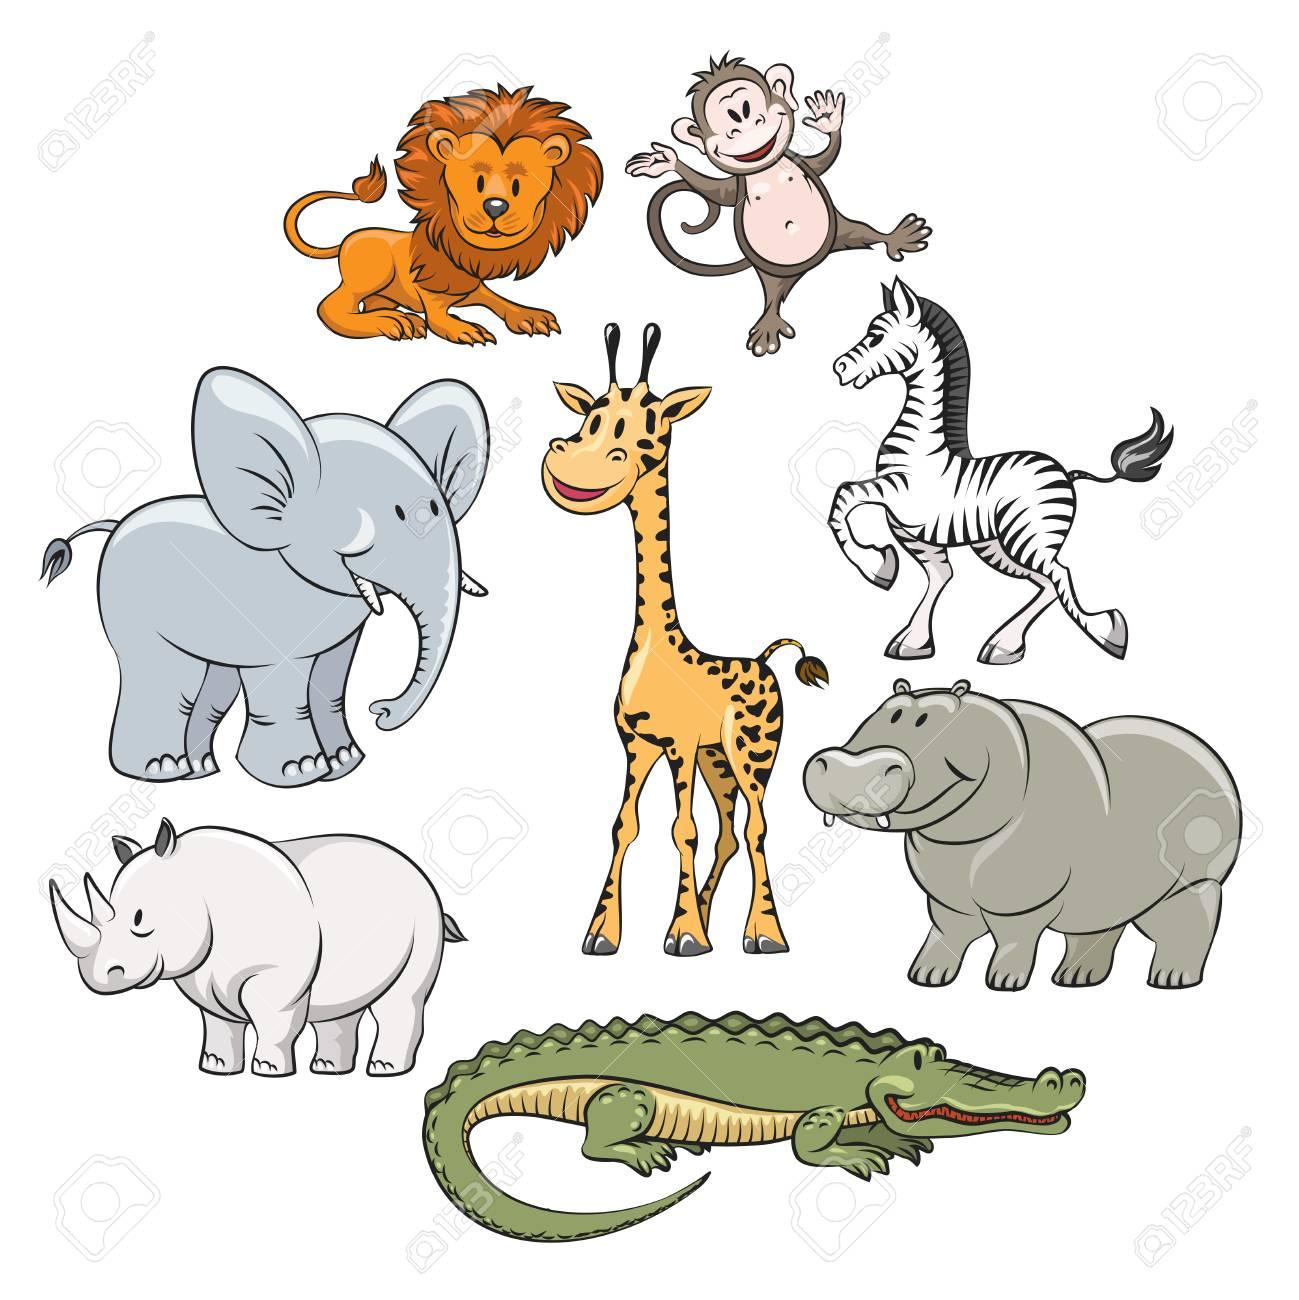 Cartoon safari and jungle animals flat icons. Vector illustration - 53922383